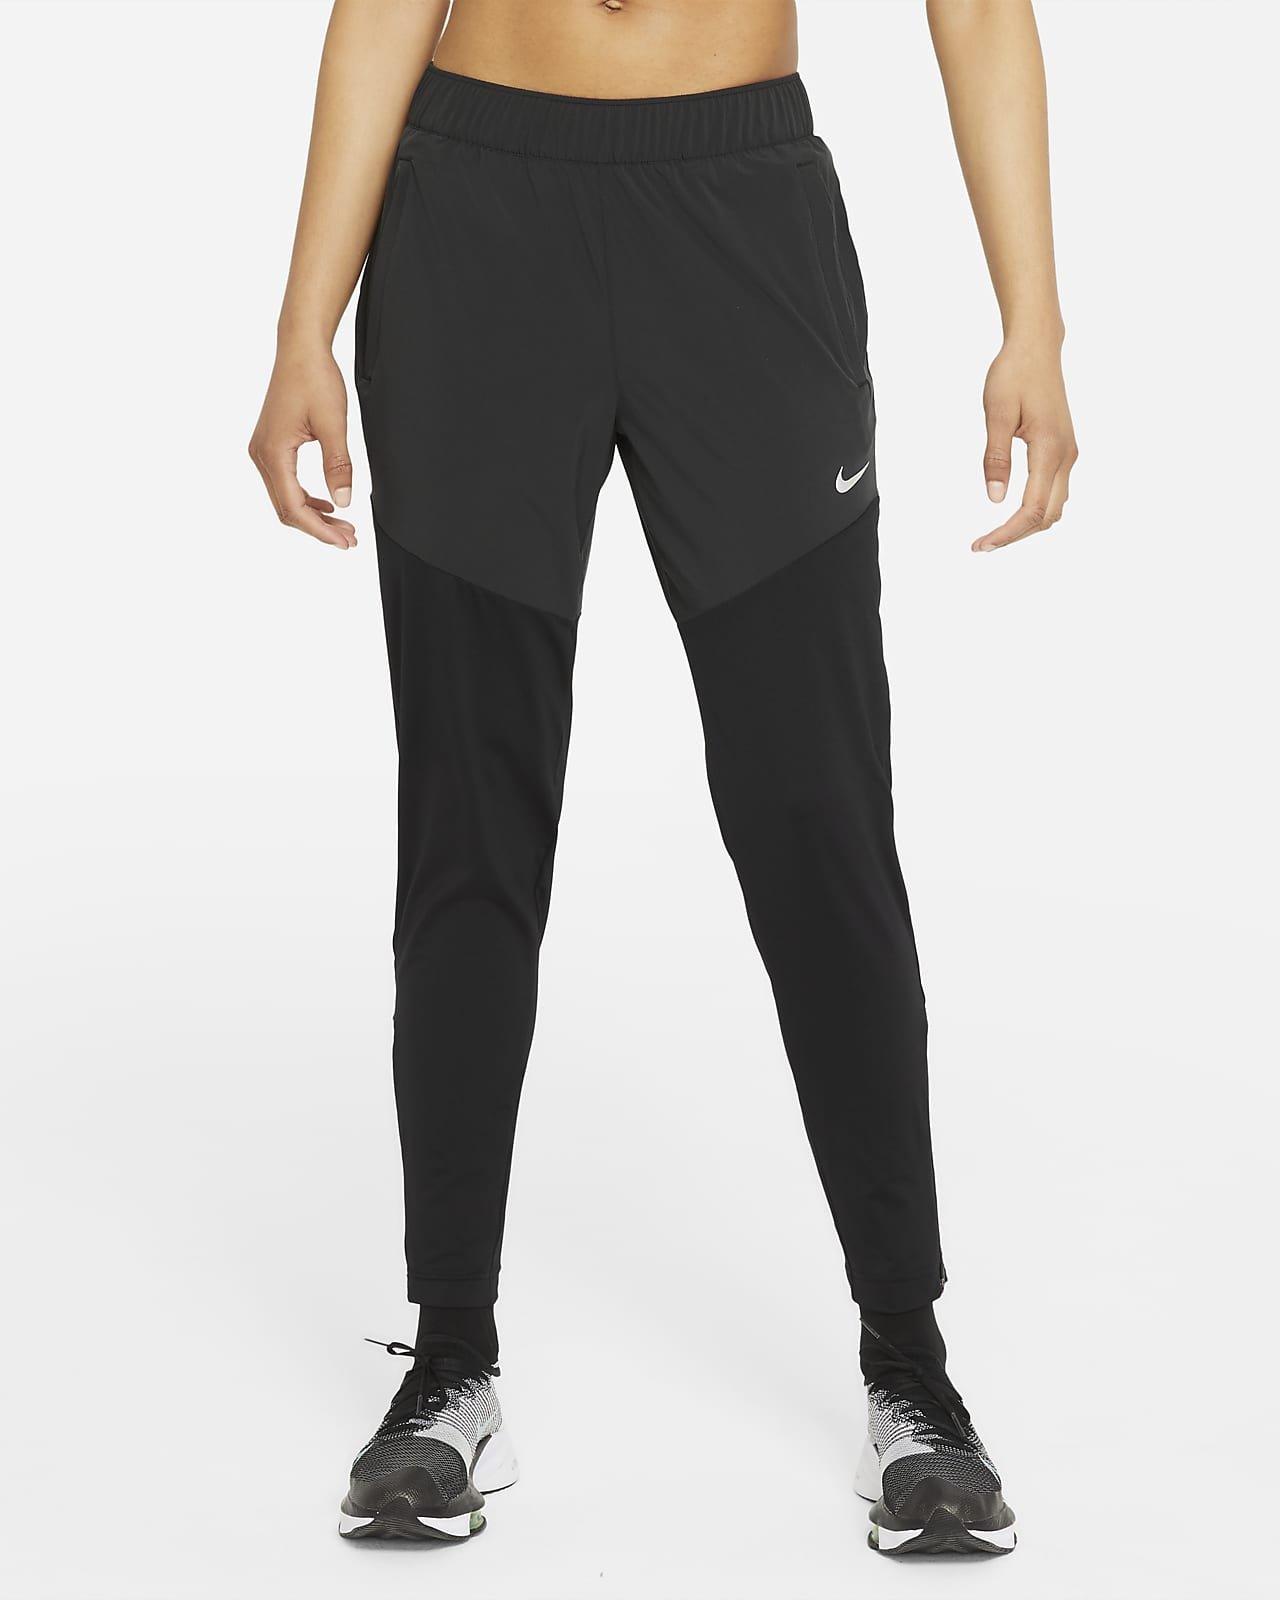 Женские беговые брюки Nike Dri-FIT Essential